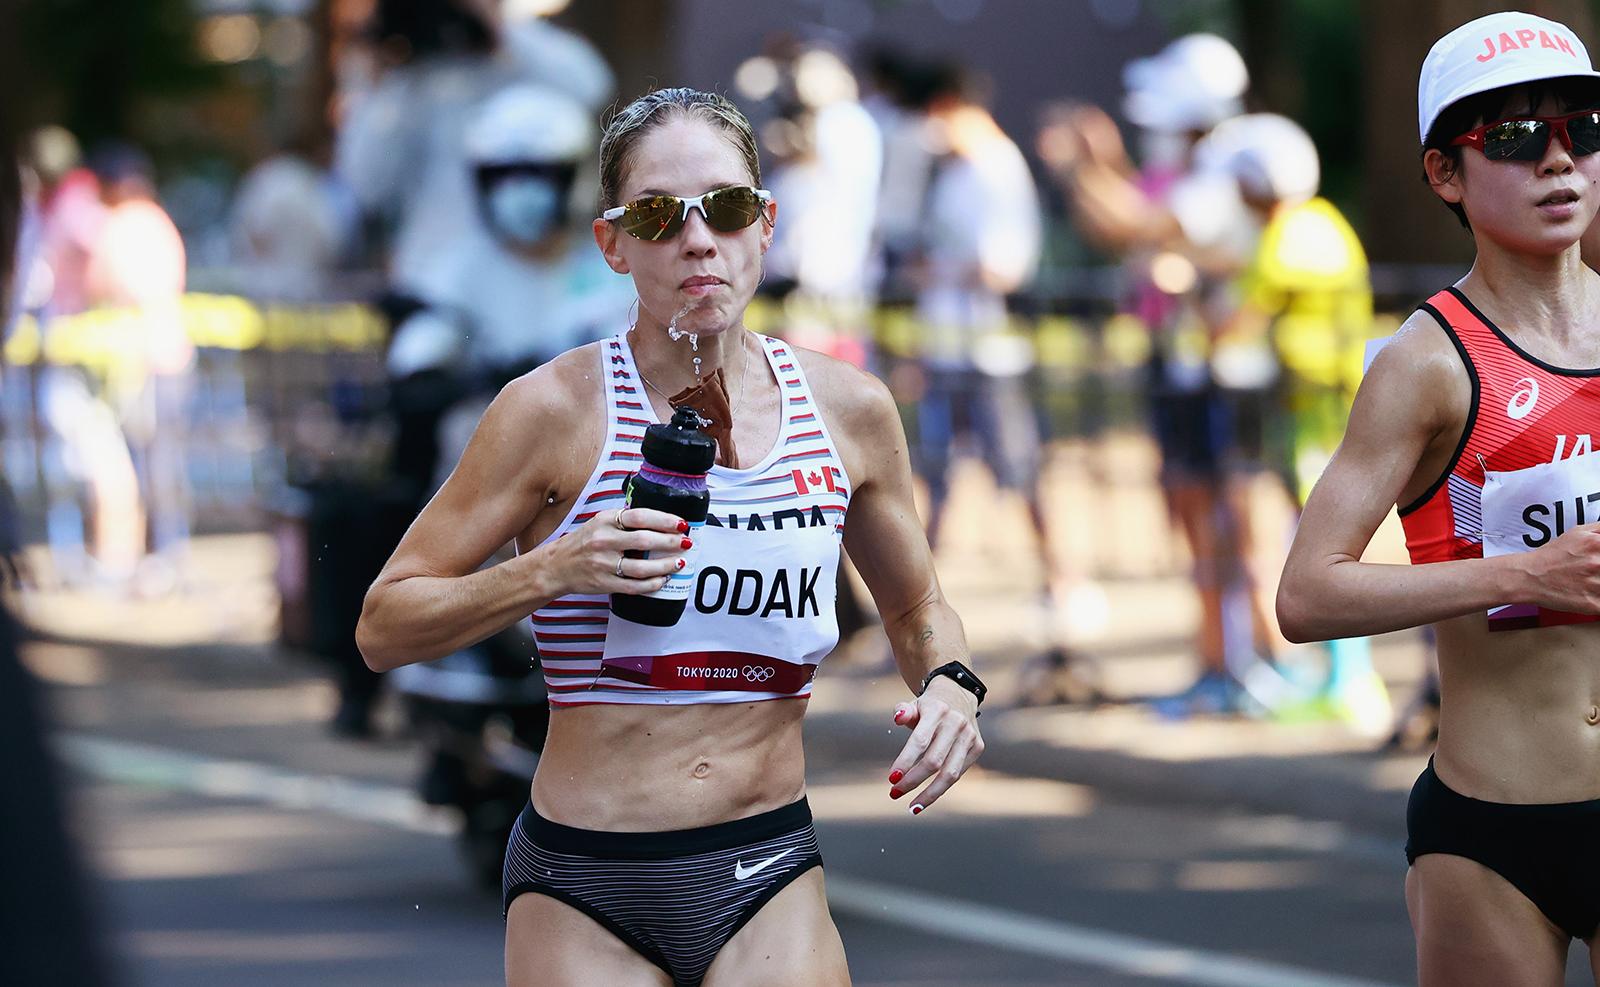 Tokyo 2020 Olympics - Athletics - Women's Marathon - Sapporo Odori Park, Sapporo, Japan - August 7, 2021. Natasha Wodak of Canada in action. REUTERS